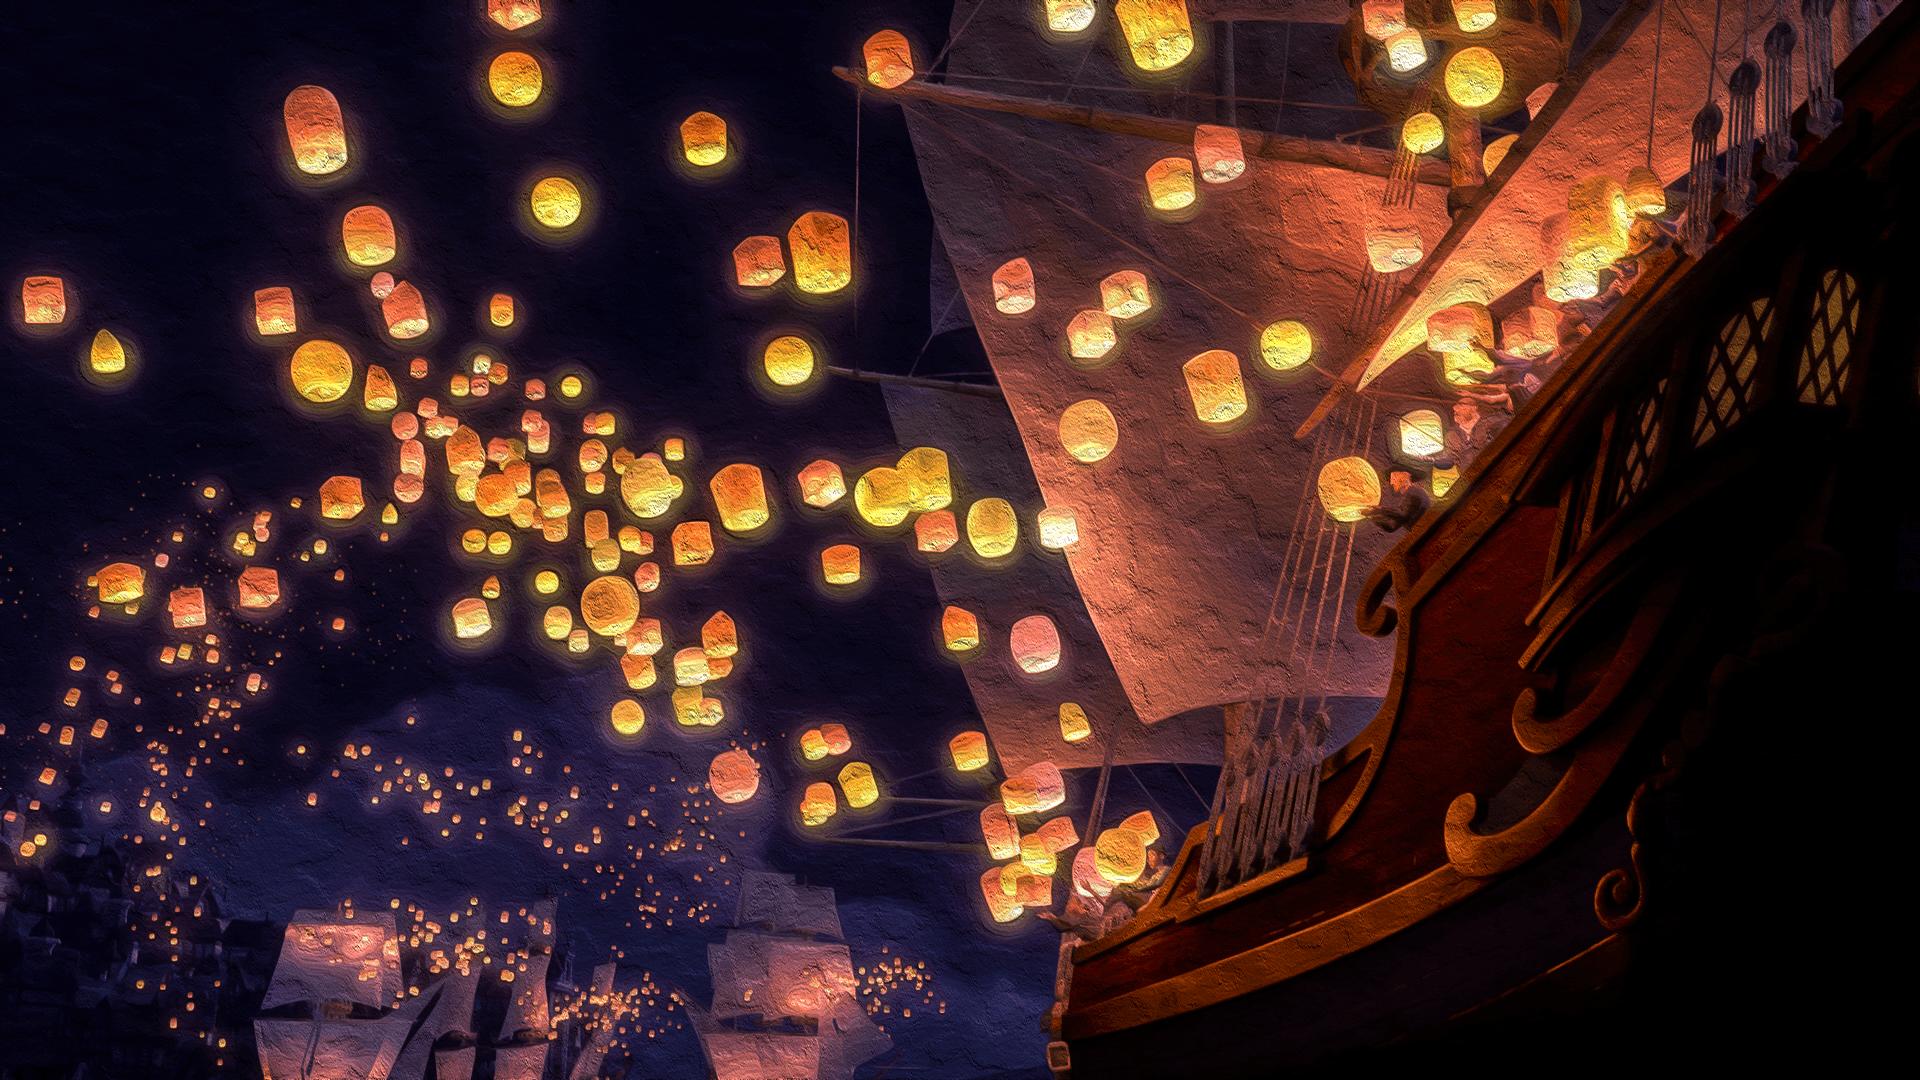 Night Lanterns Wallpapers Wallpaper Cave